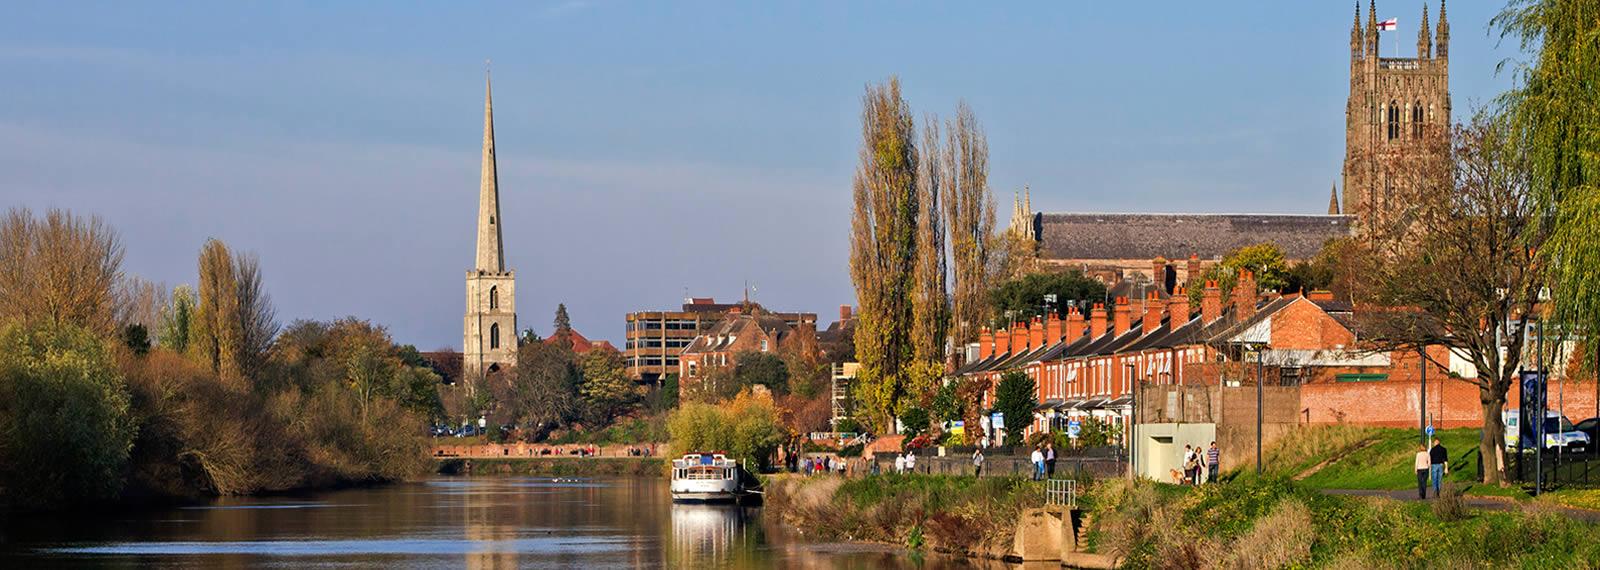 Abberley, Worcester